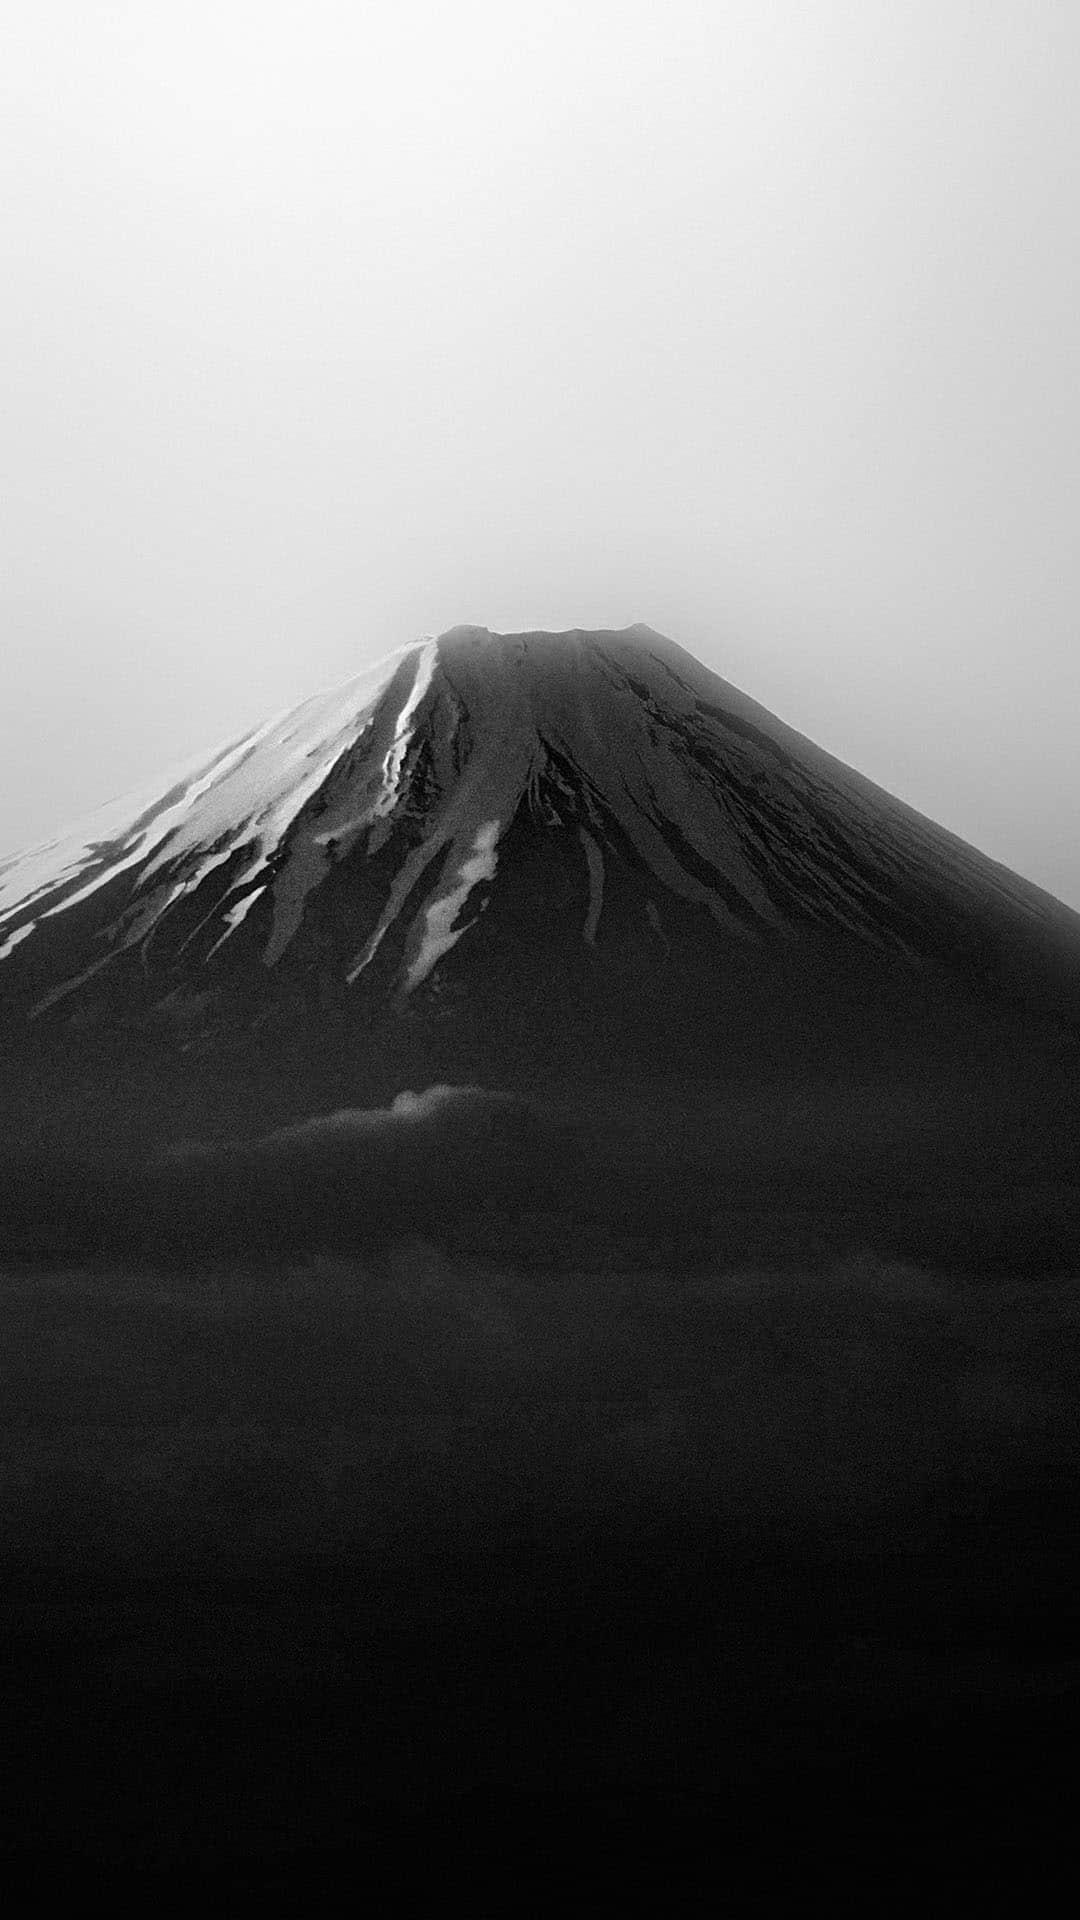 Mount Fuji Japan Black White Android Wallpaper